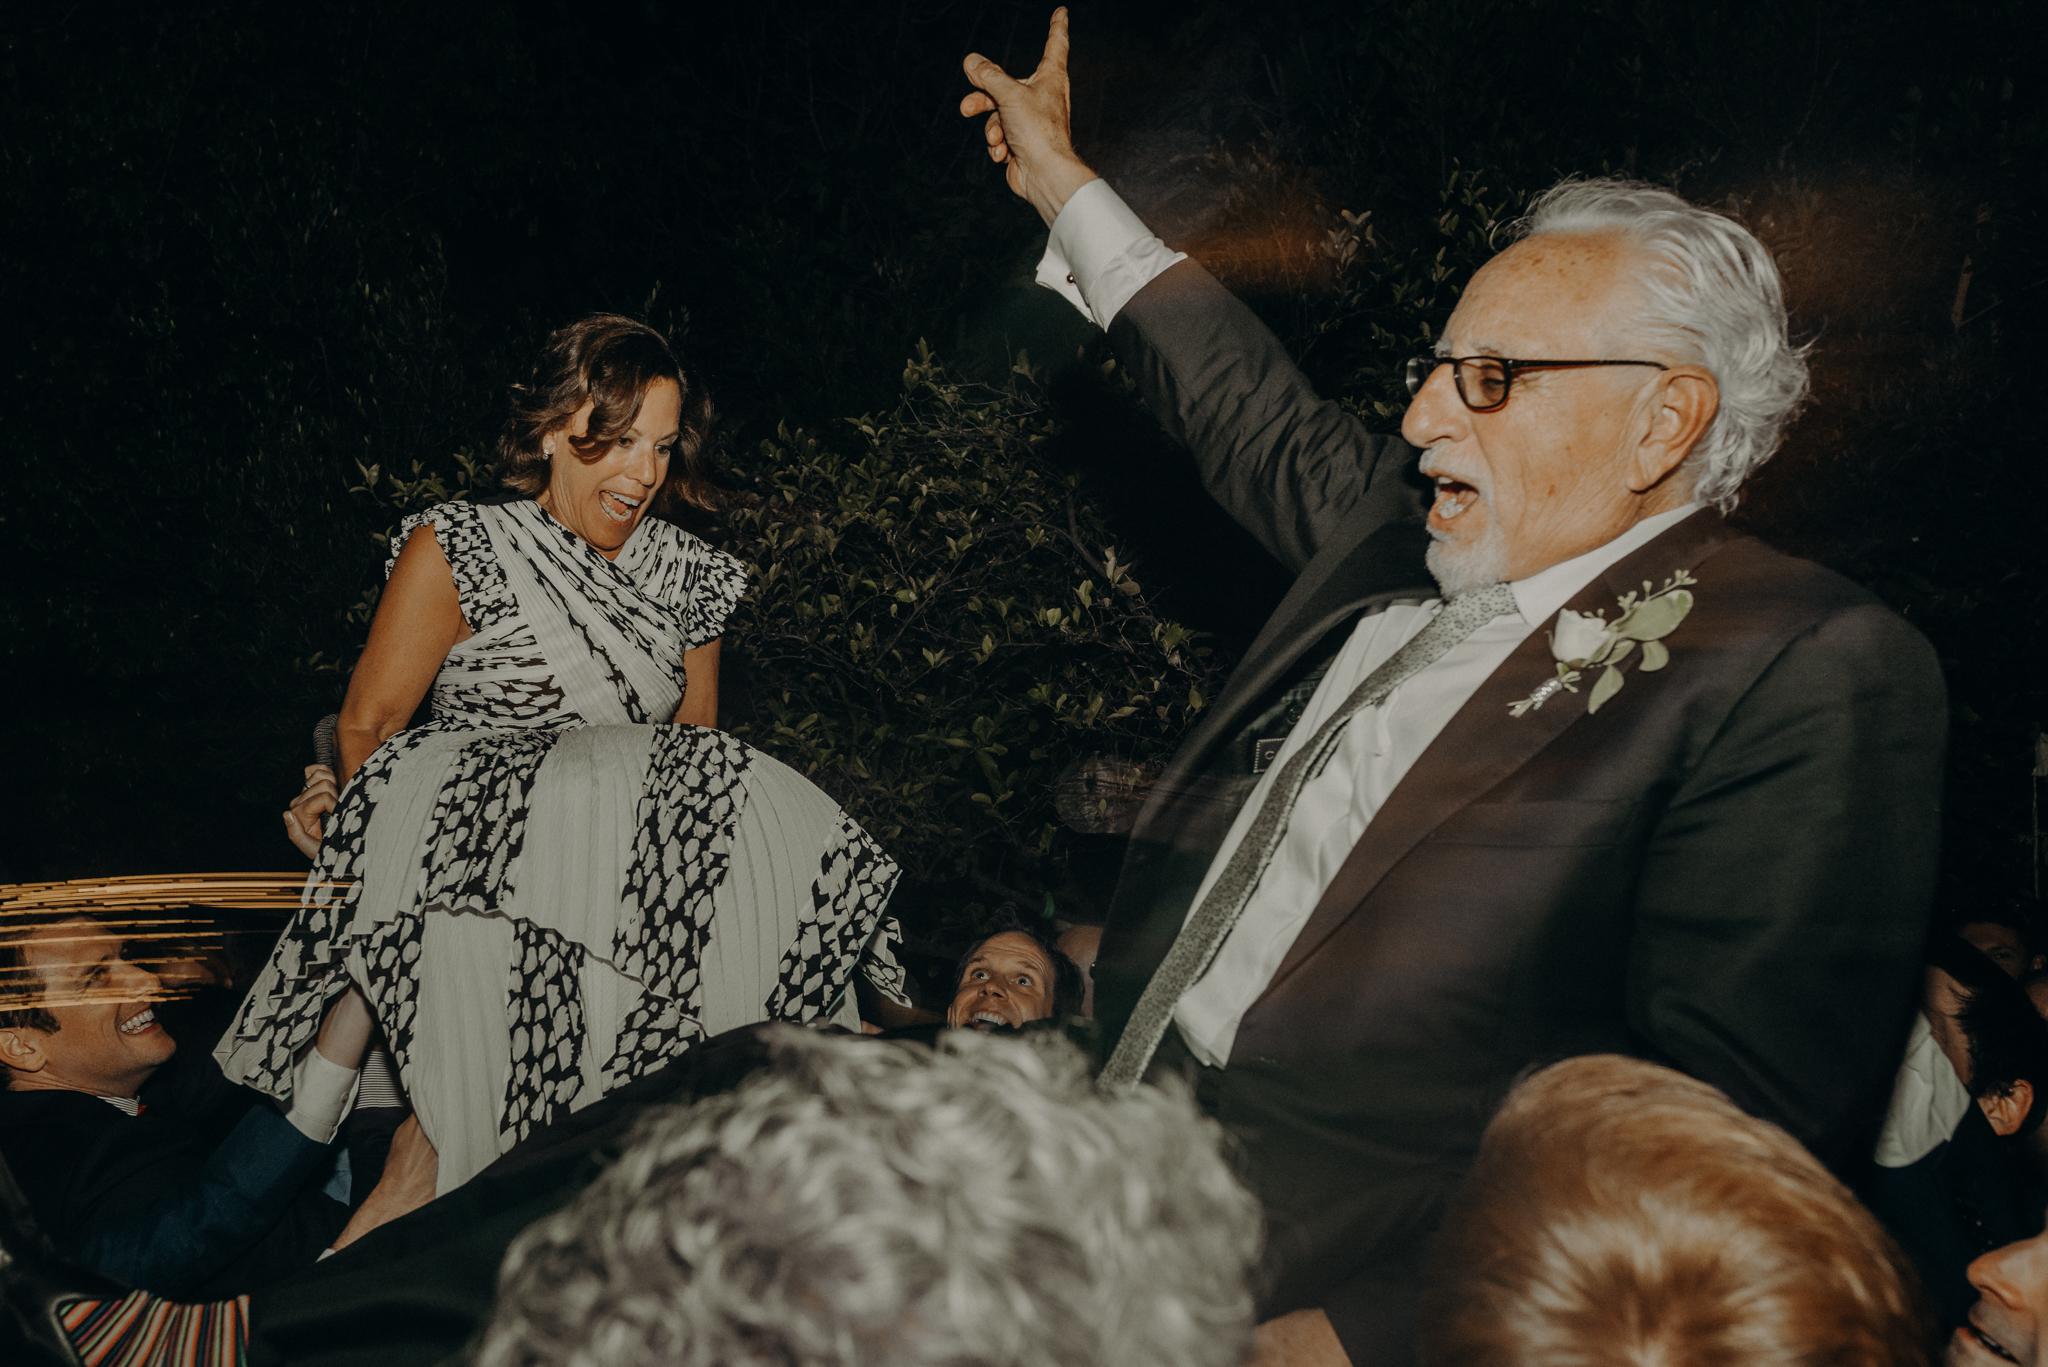 Isaiah + Taylor Photography - Private Estate Backyard Wedding - Beverly Hills - Los Angeles Wedding Photographer - 148.jpg